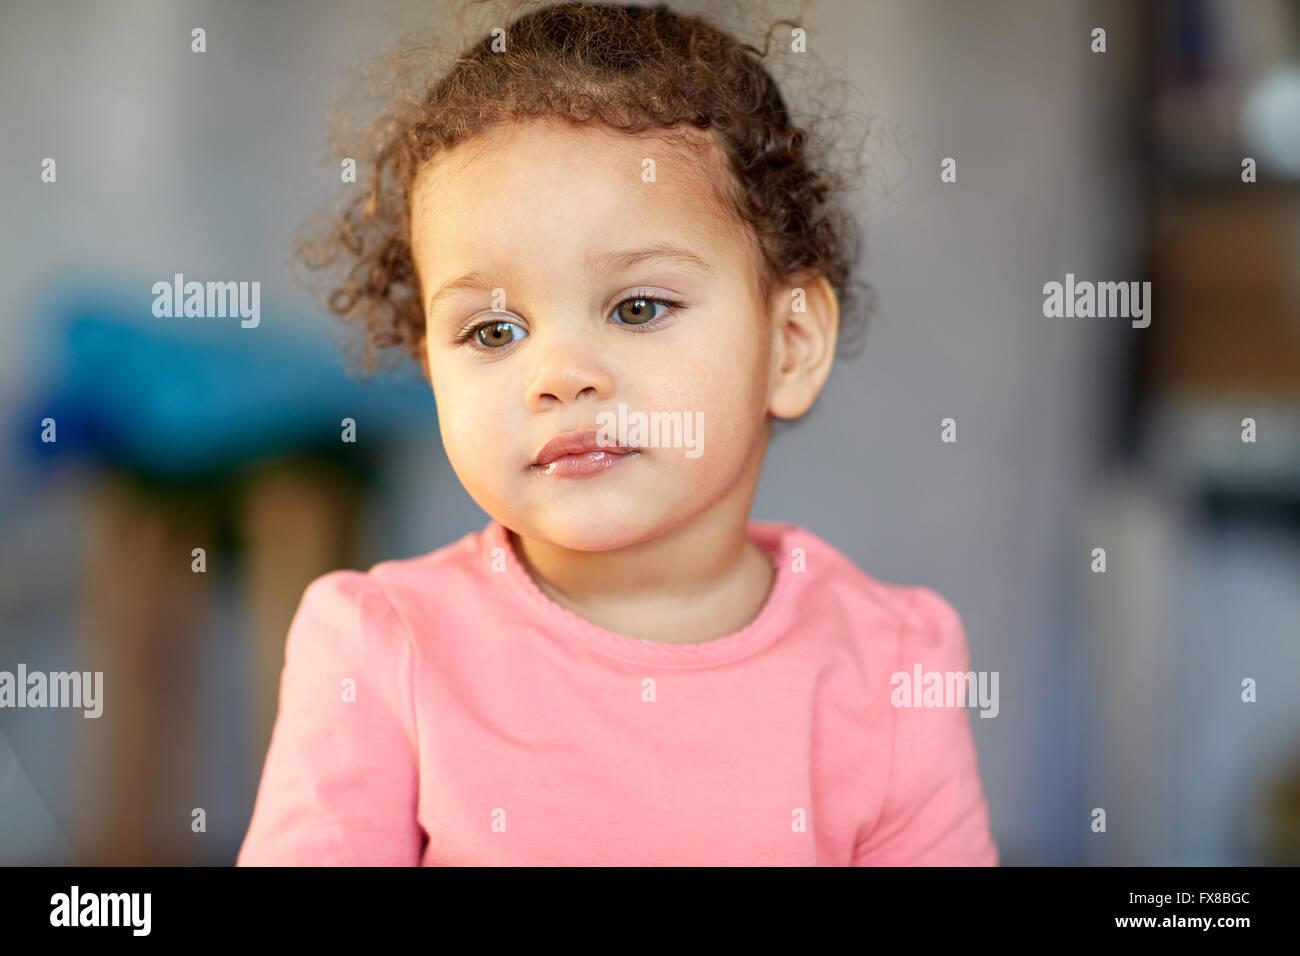 beautiful little mulatto baby girl face stock photo: 102217596 - alamy